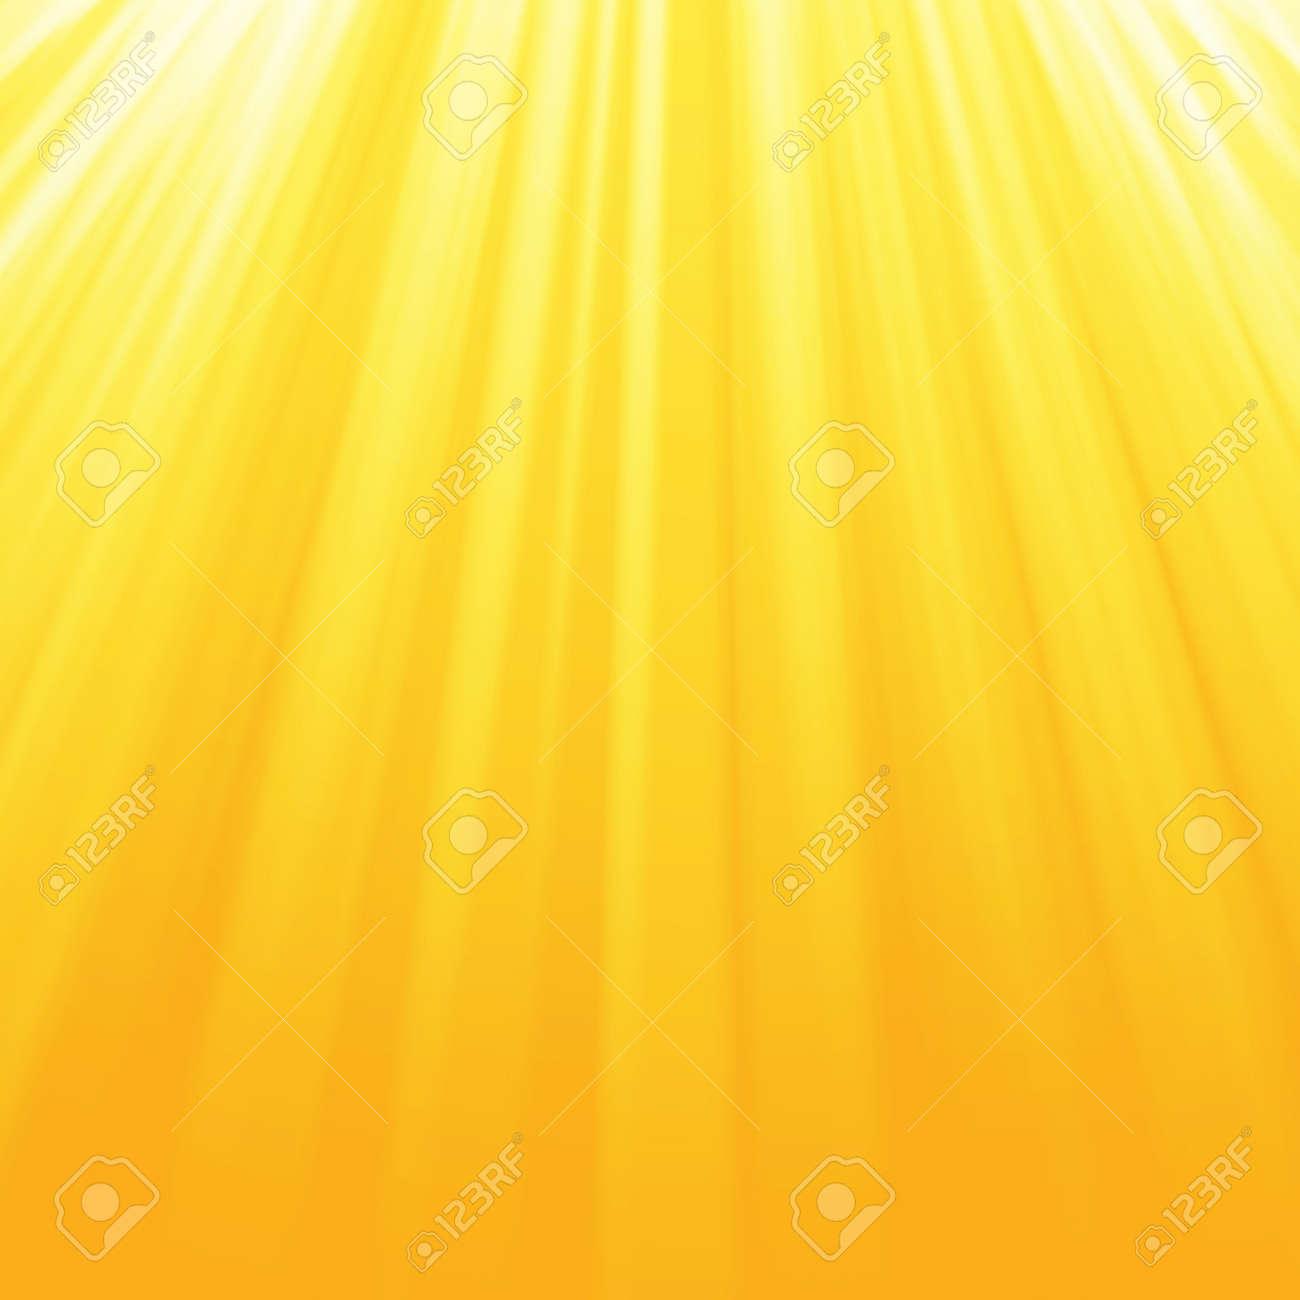 db61a60f74e45 shiny sun beams, summer background. yellow & orange sunburst background  Stock Photo - 59434709